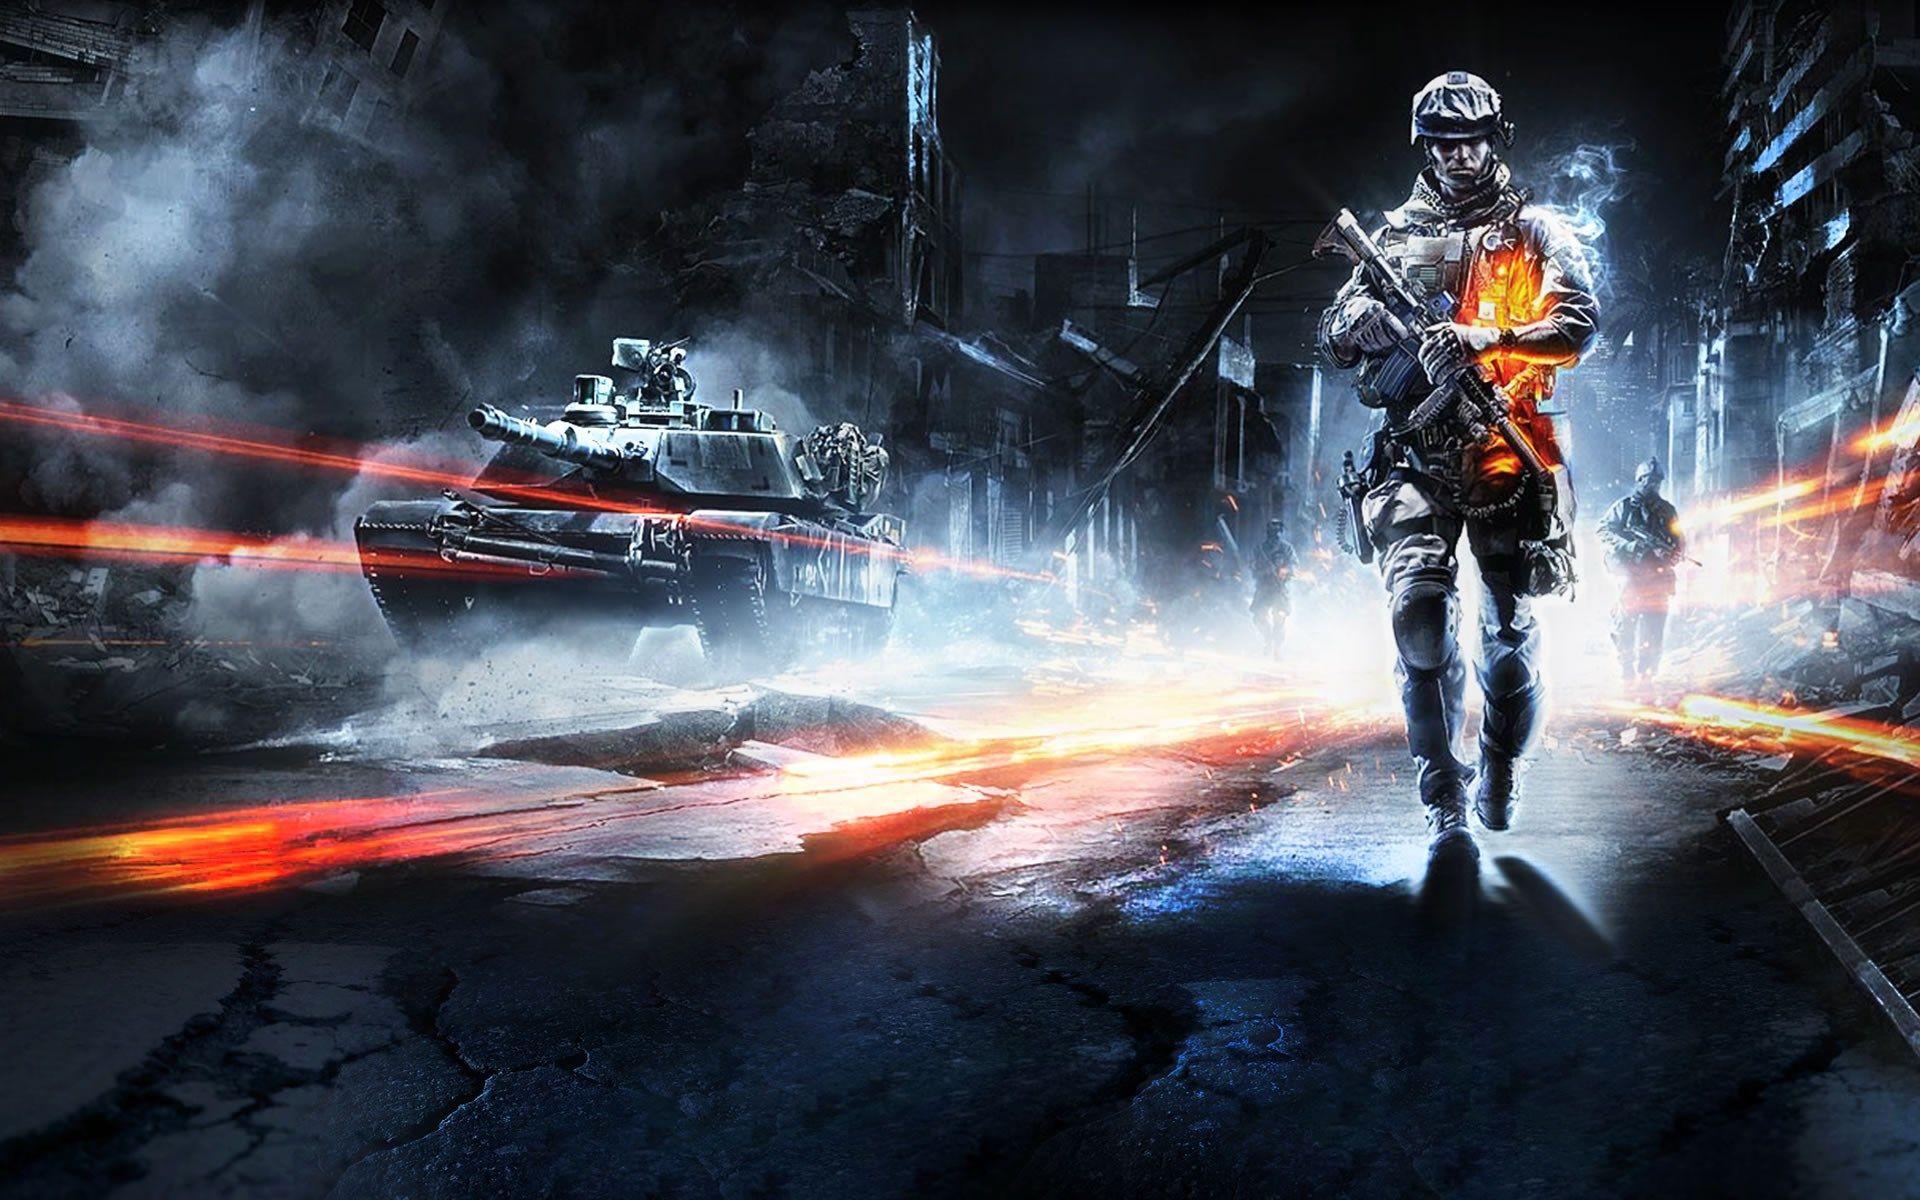 Battlefield 3 Wallpaper To Download Stanley Wilkinson 2017 03 20